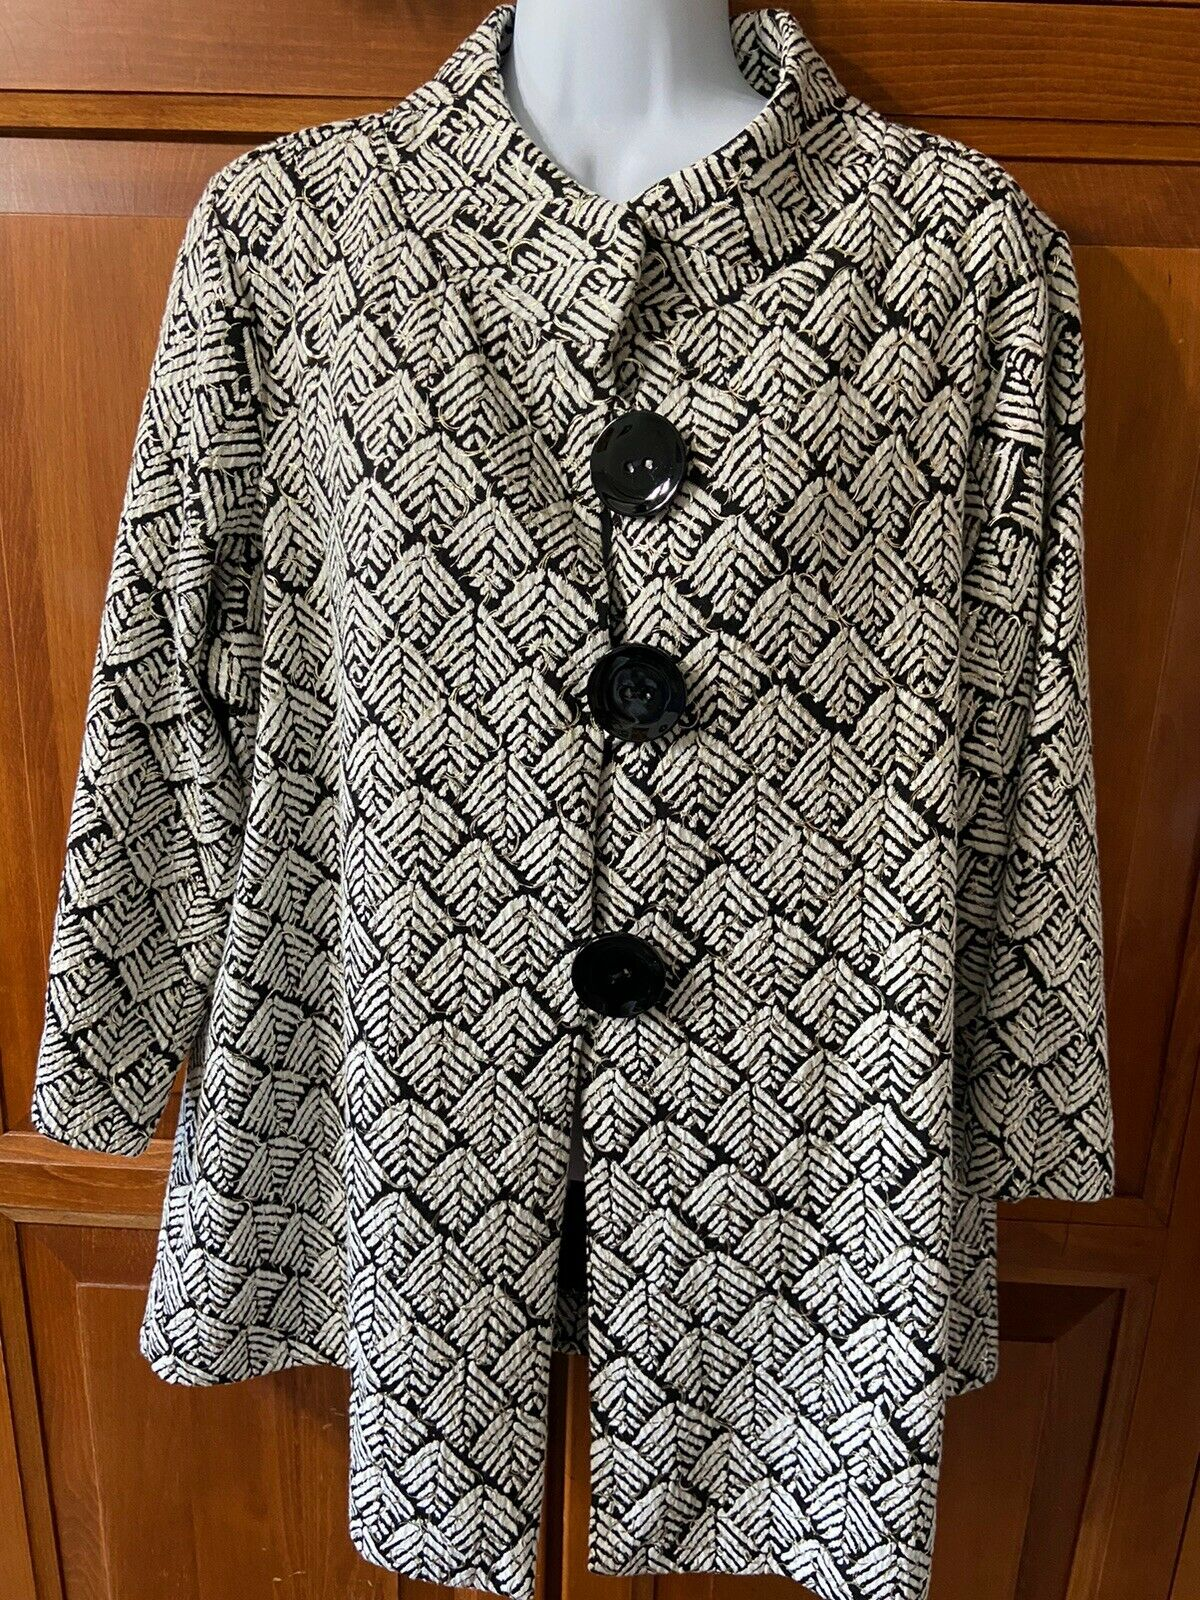 Women's JM Collections Jacket 3/4 Sleeve Black/White Sz 1X